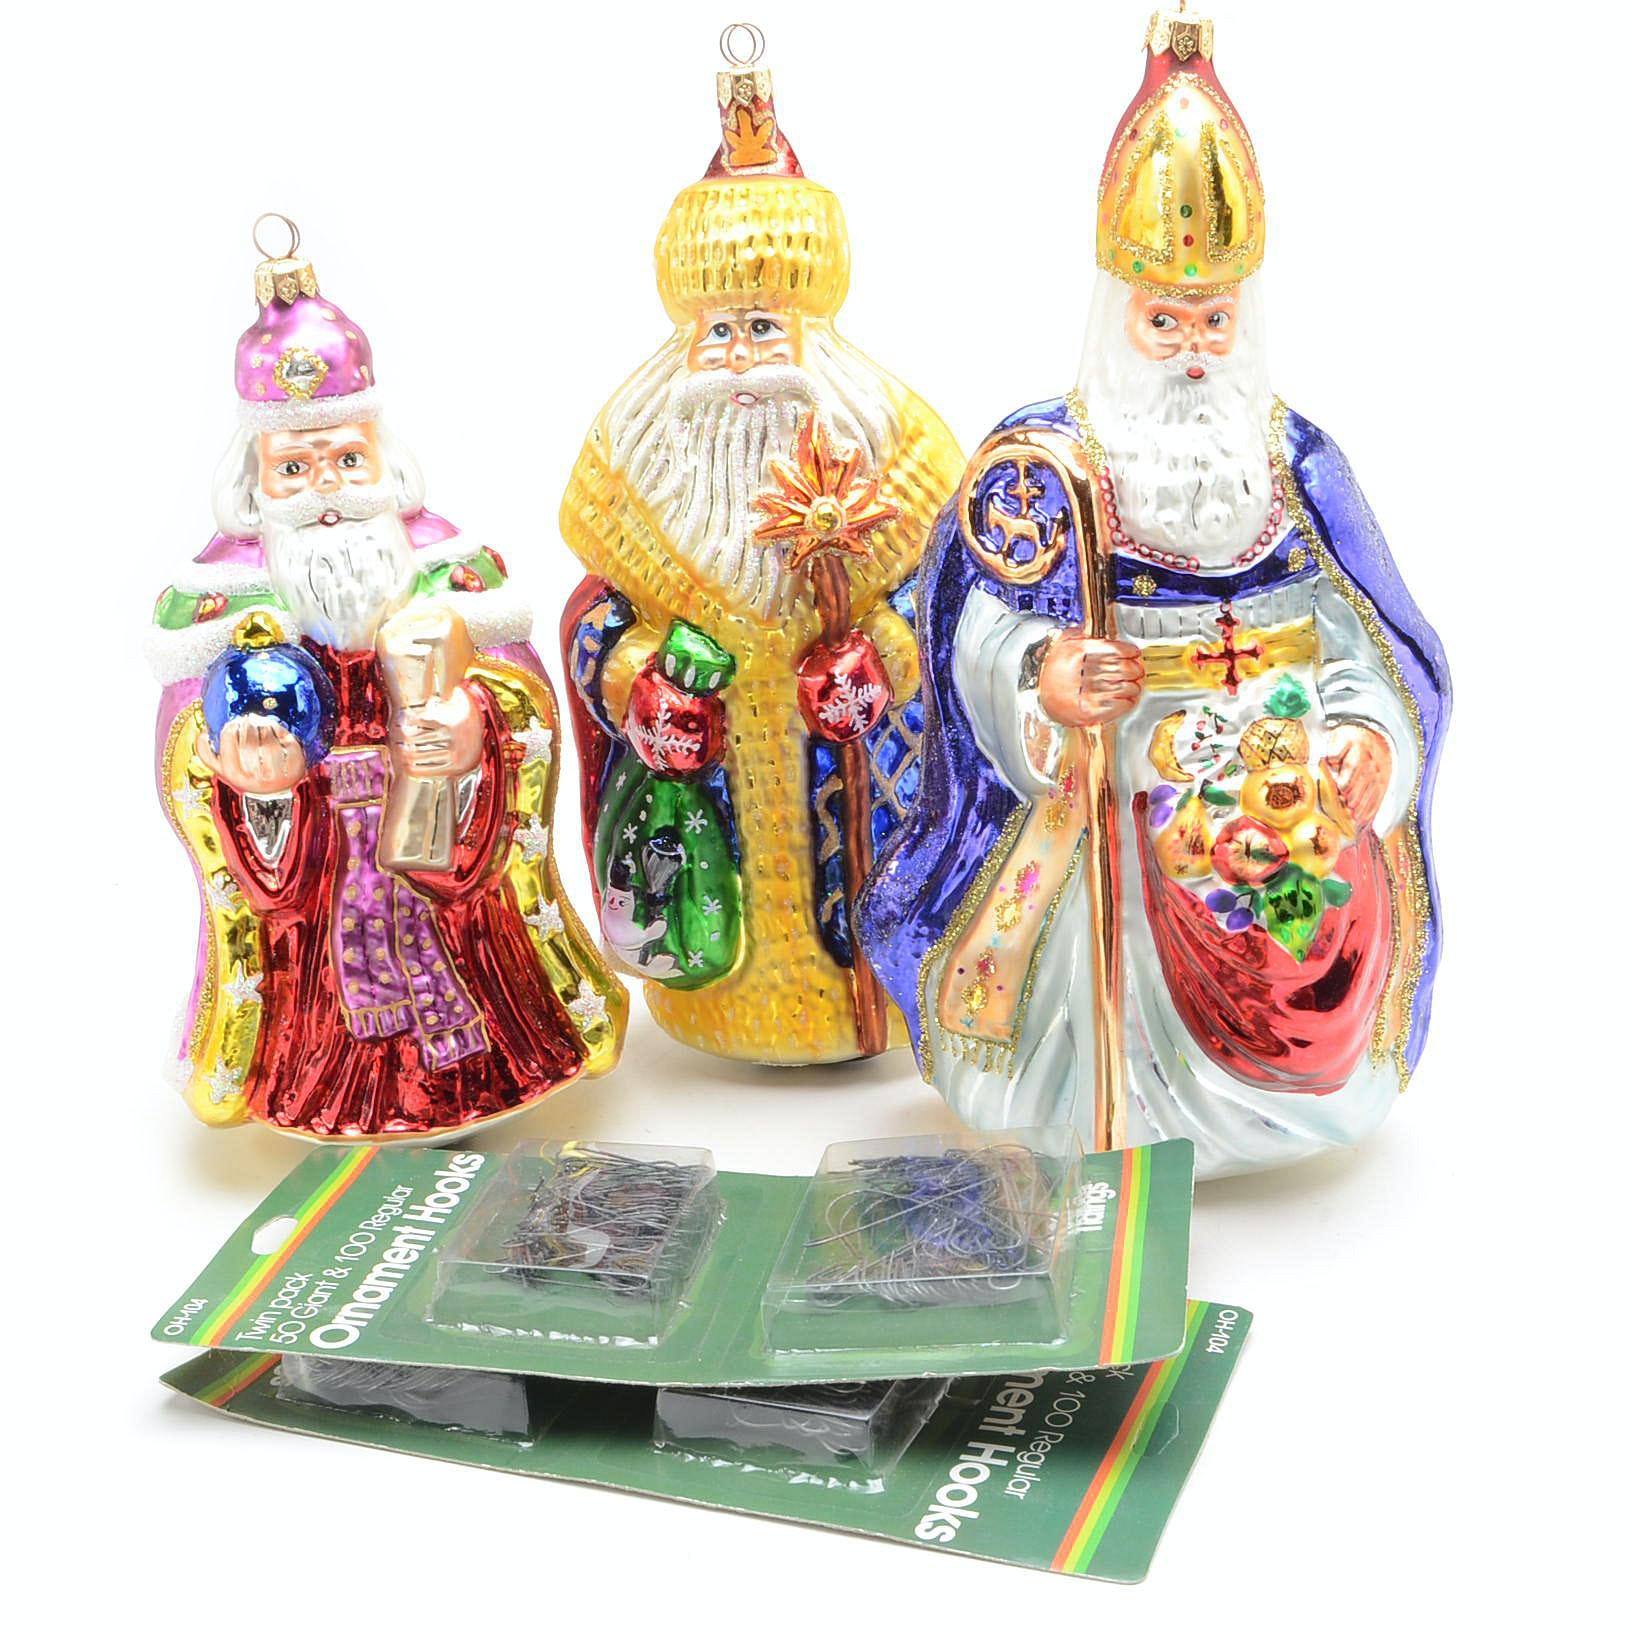 Christopher Radko St. Nicholas Ornaments